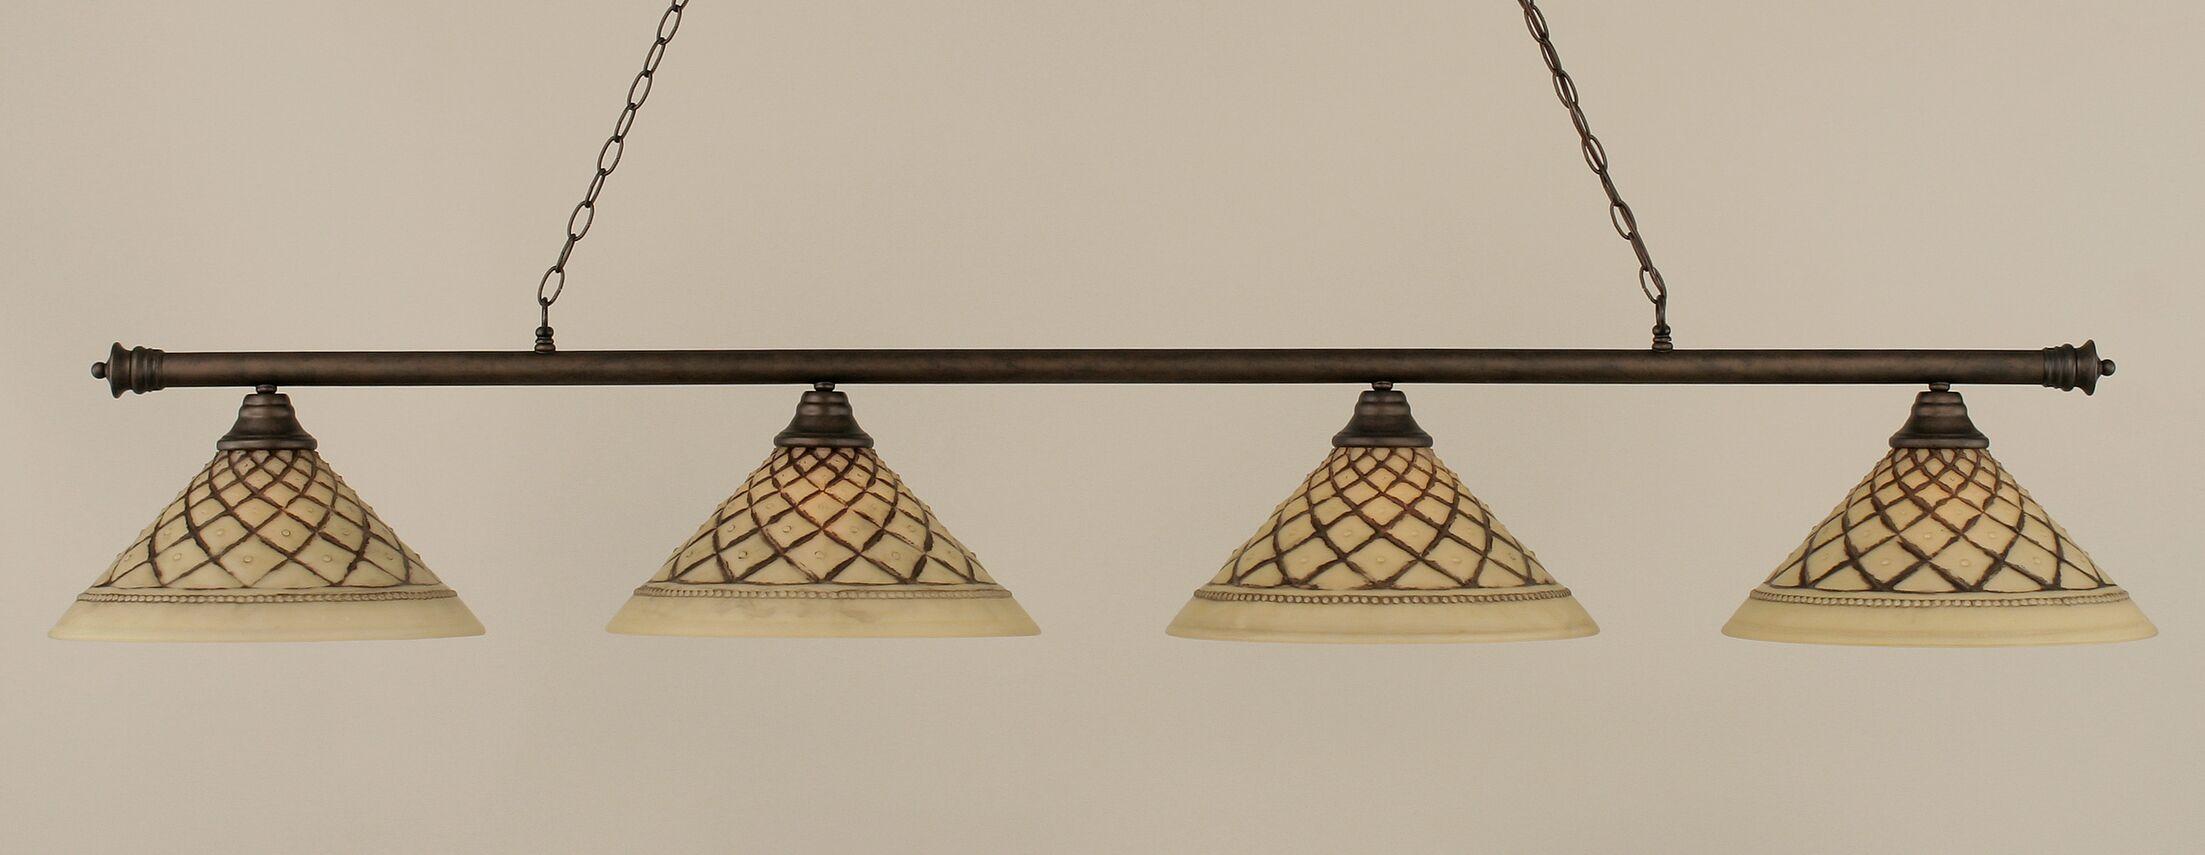 Mendez 4-Light Billiard Light Finish: Bronze